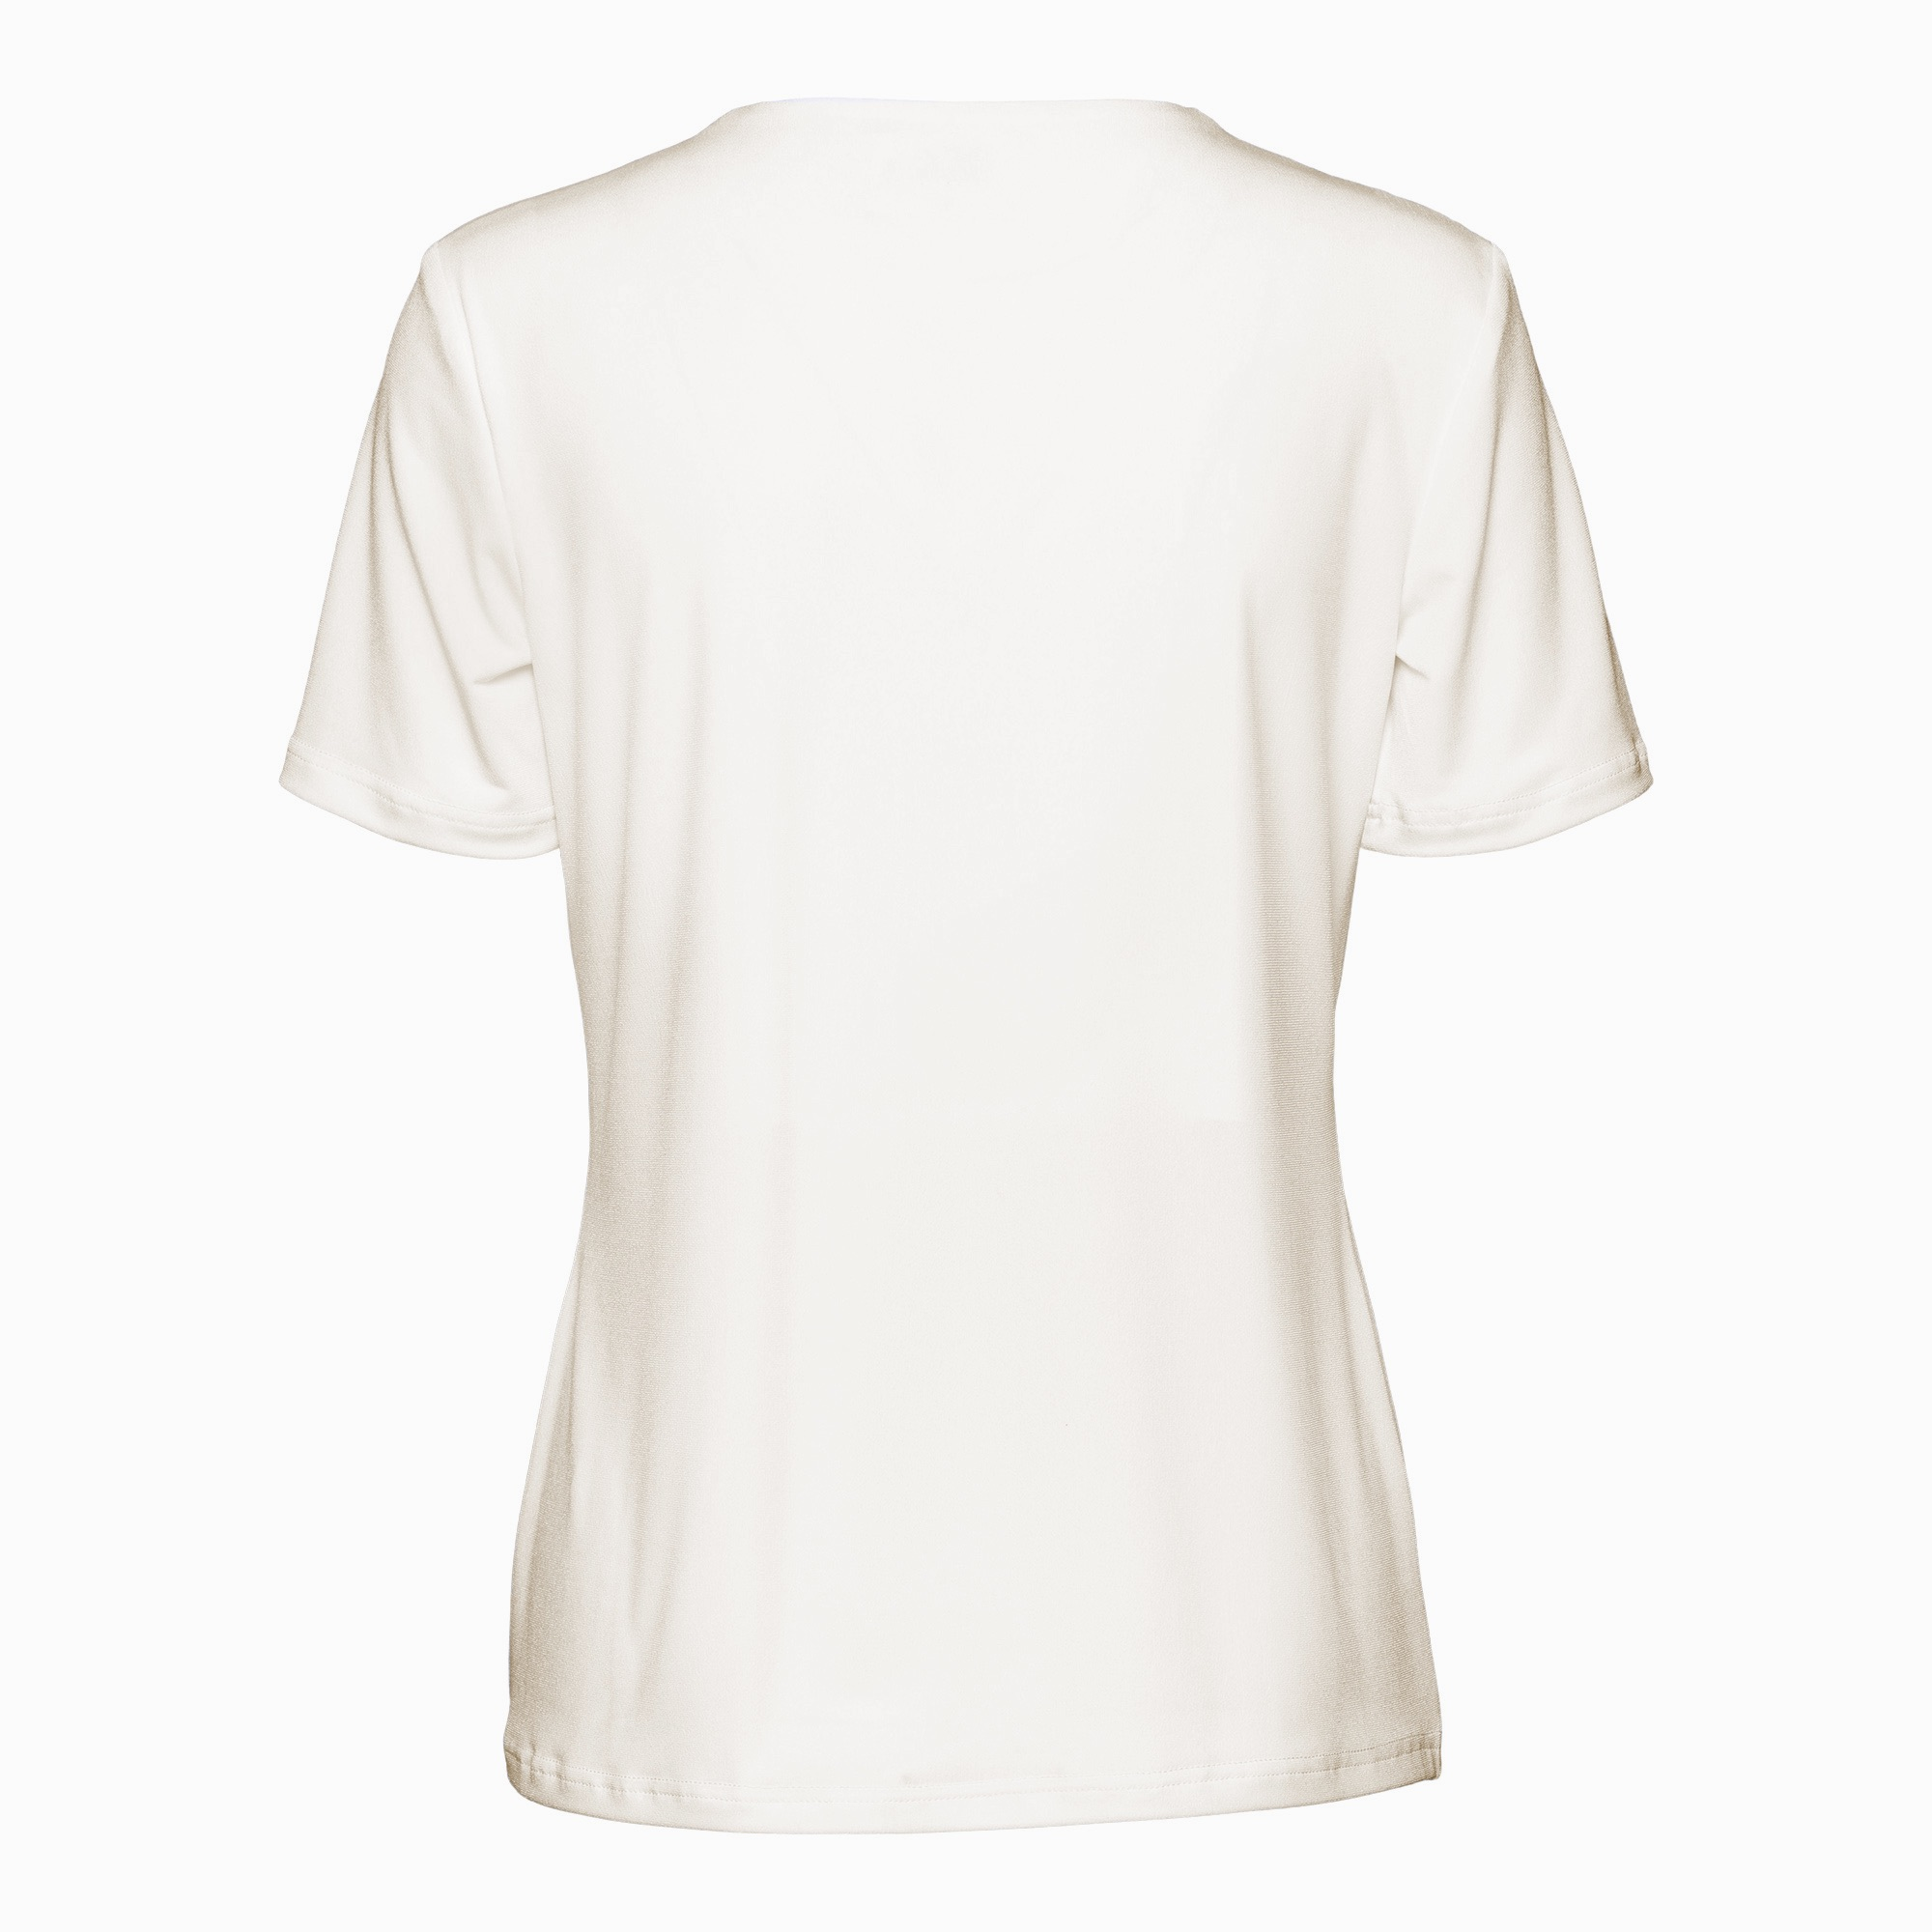 "Shirt ""Lovi"" from Co&Woman"